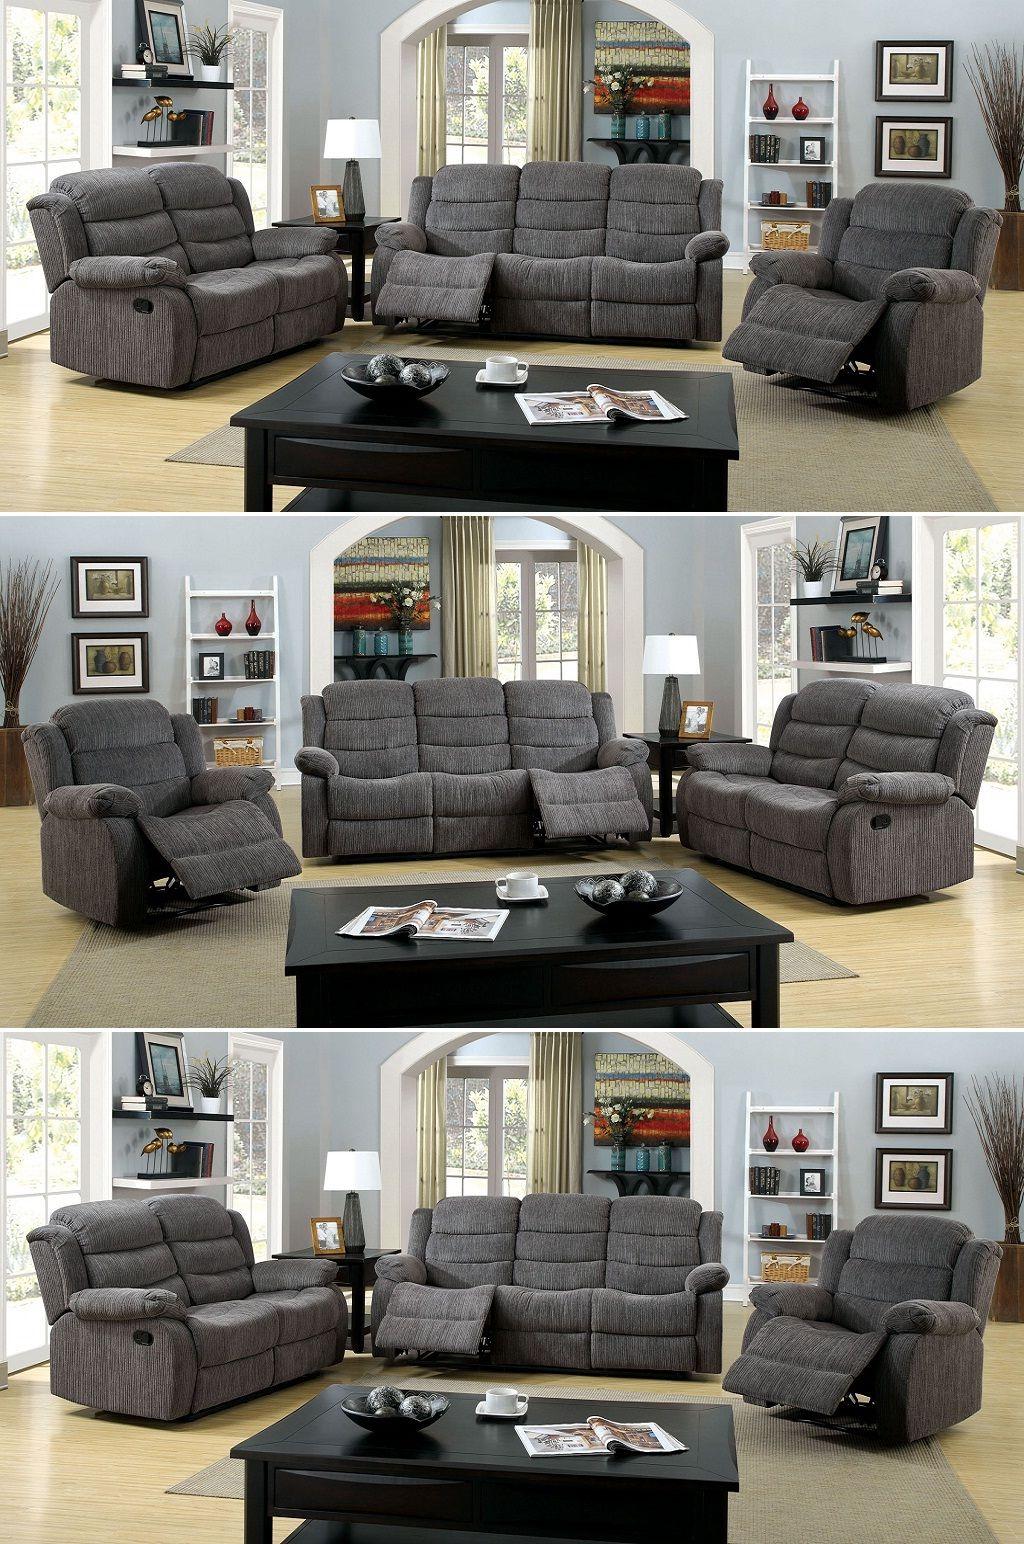 Fabric Reclining Sofa Sets Reclining Sofa Furniture Design